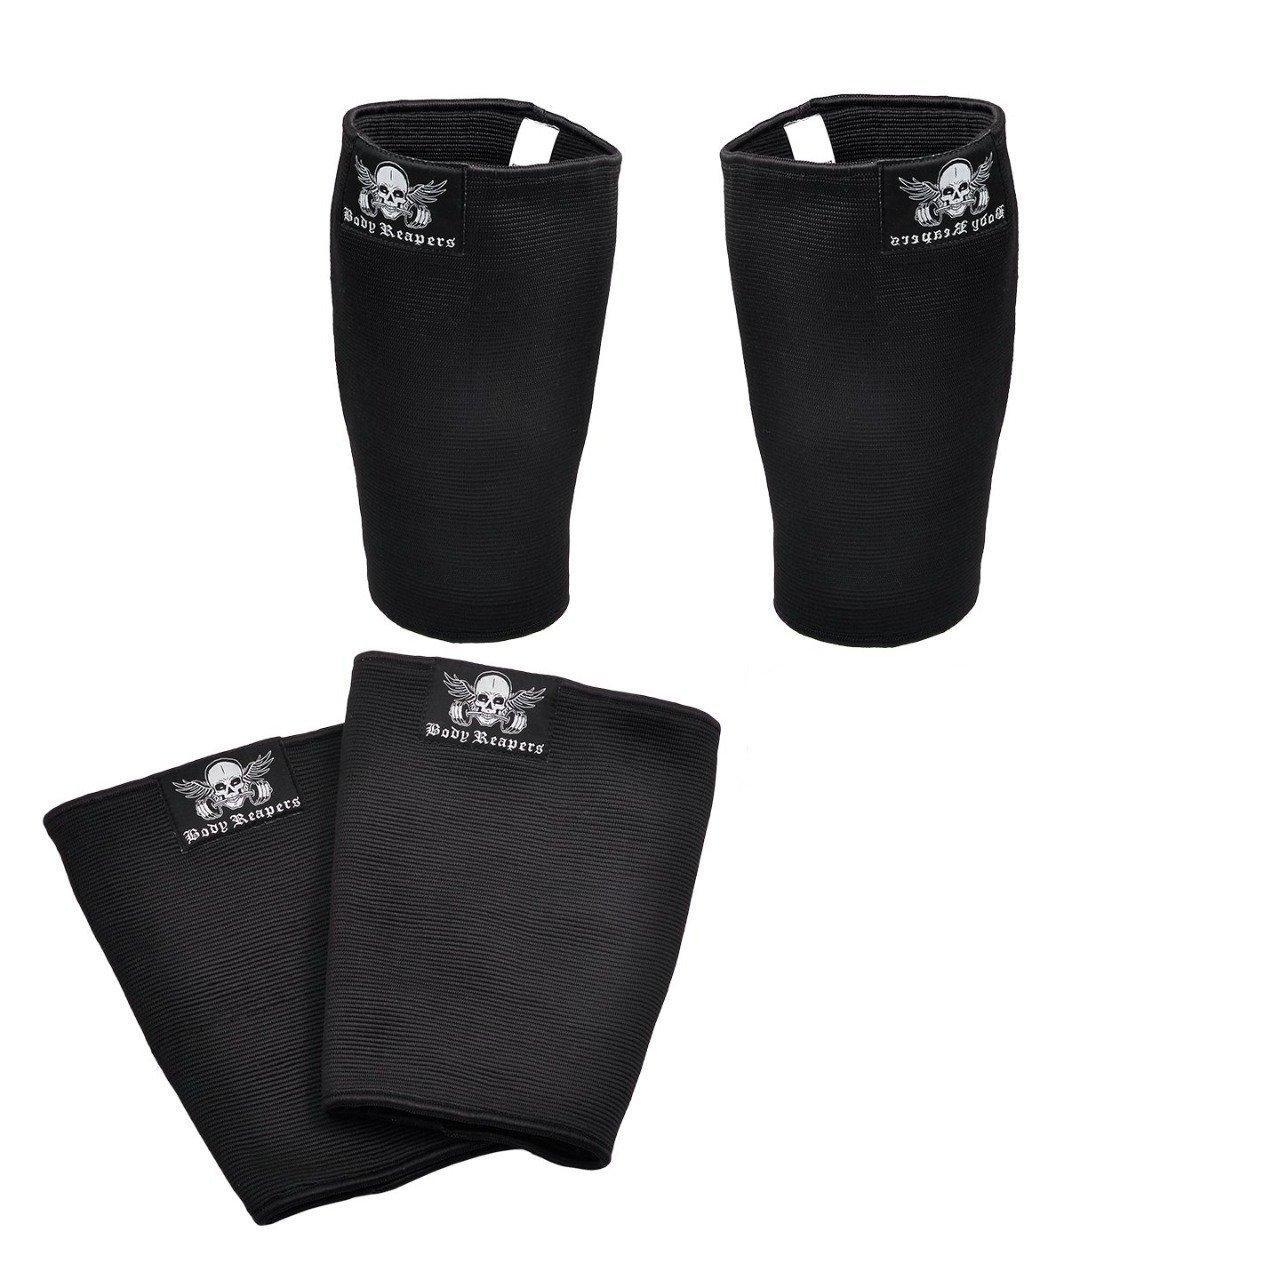 Нарукавник Body Reapers Elbow Sleeves - Anti-Slip